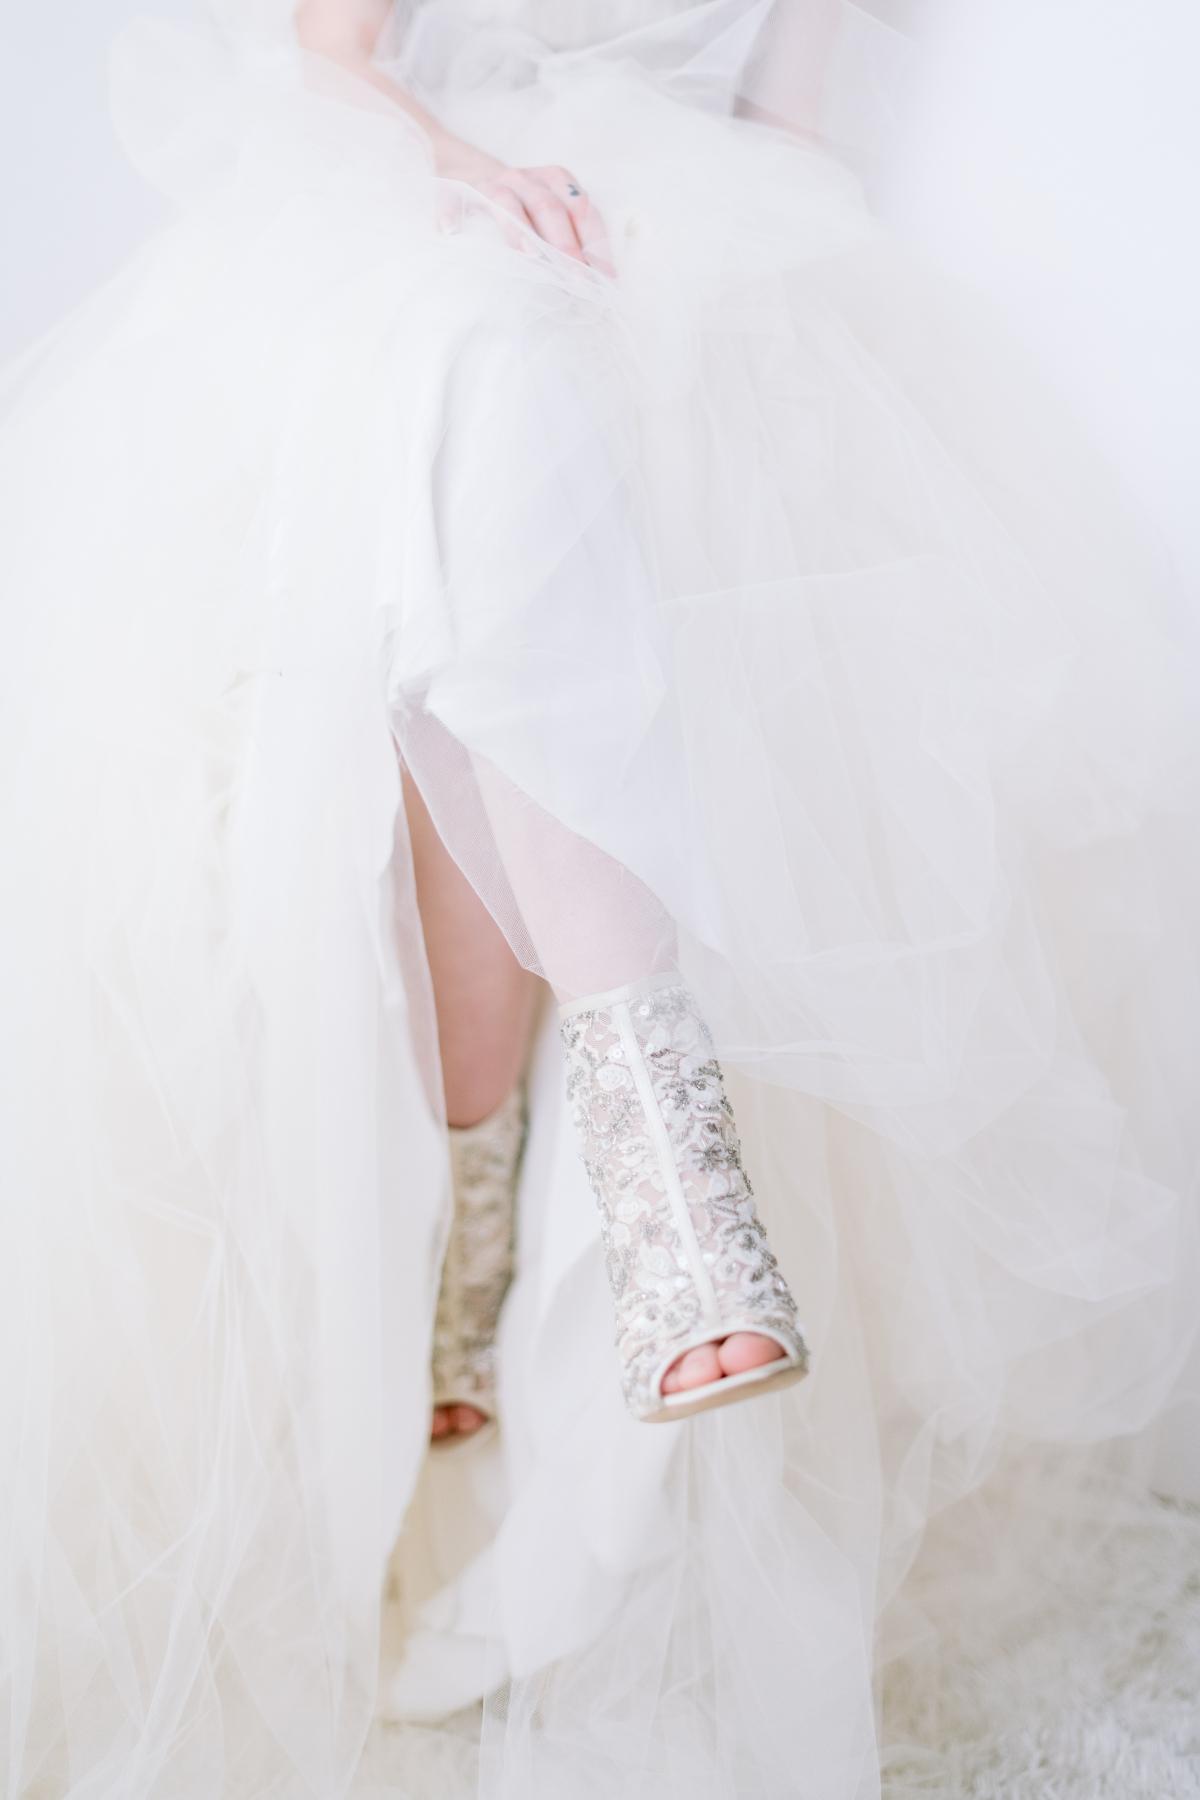 Laura Lanzerotte Bridal Danielle Heinson Photography 47